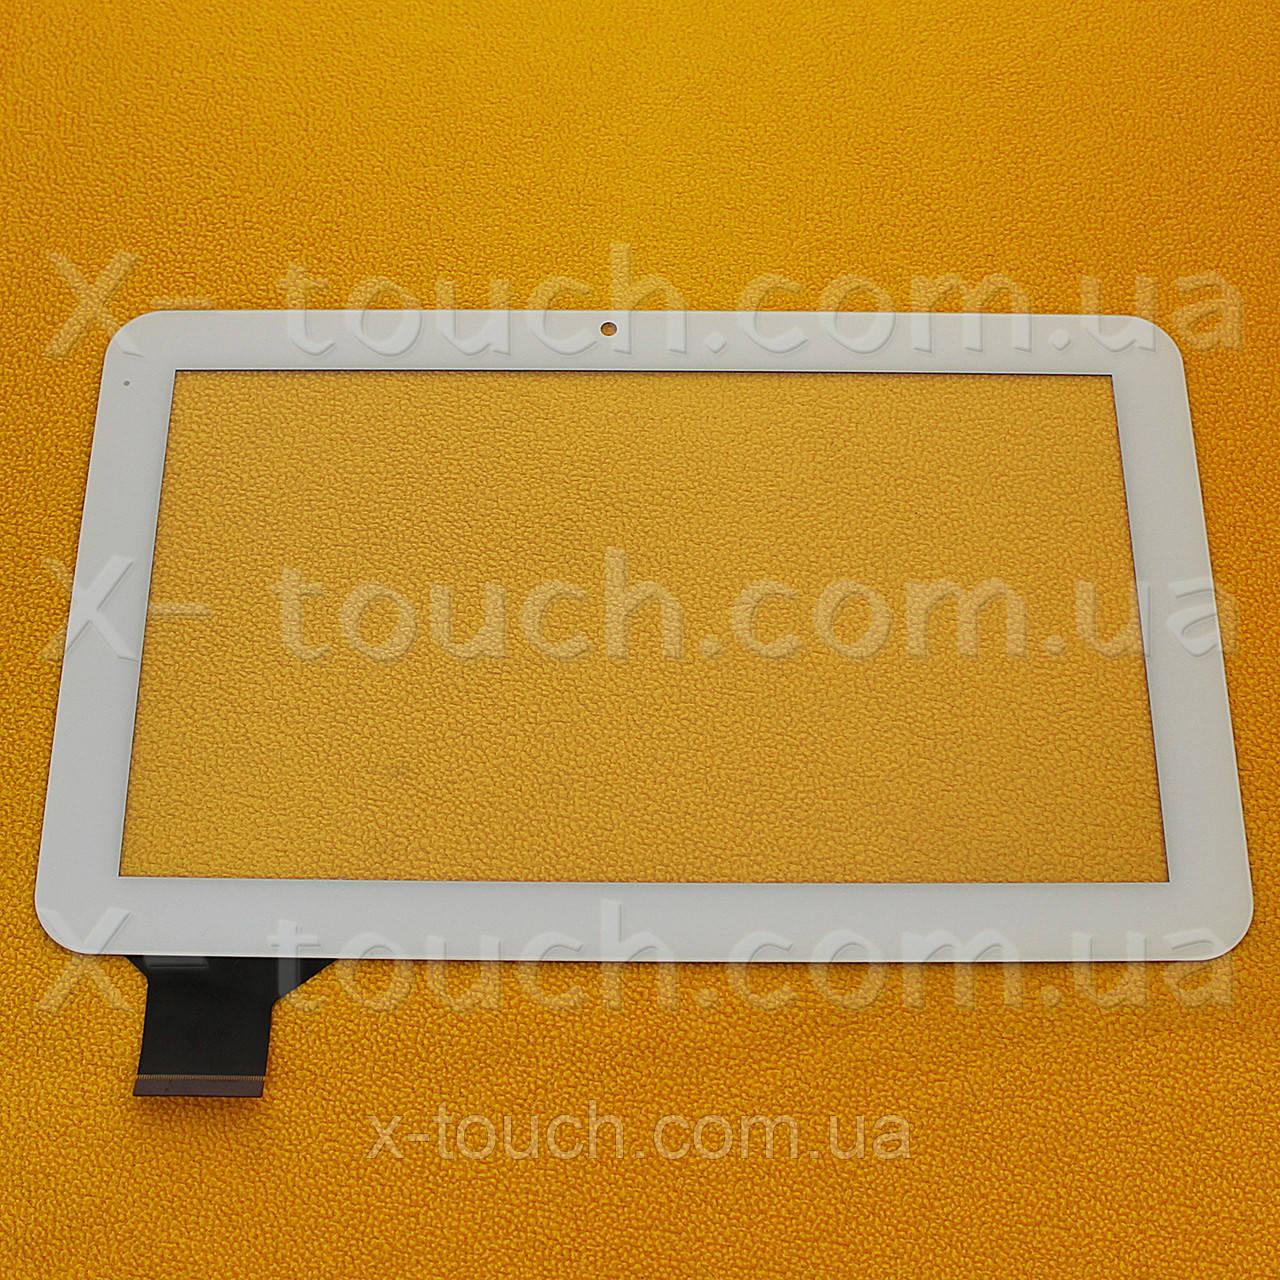 Тачскрин, сенсор  HOTATOUH C160259A1-DRFPC160T-V1.0 белый для планшета